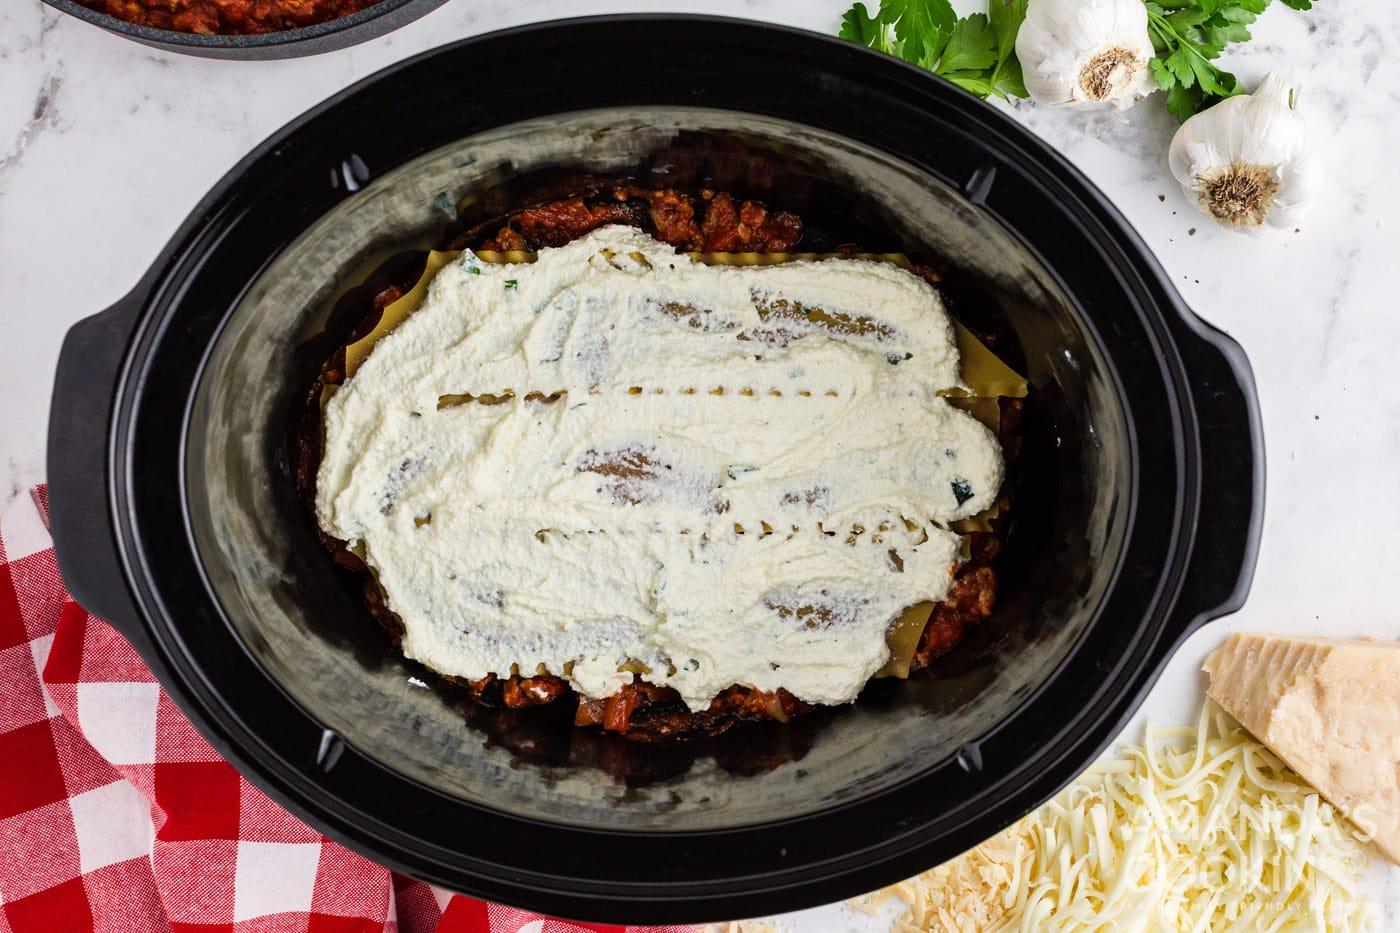 ricotta mixture on top of lasagna noodles